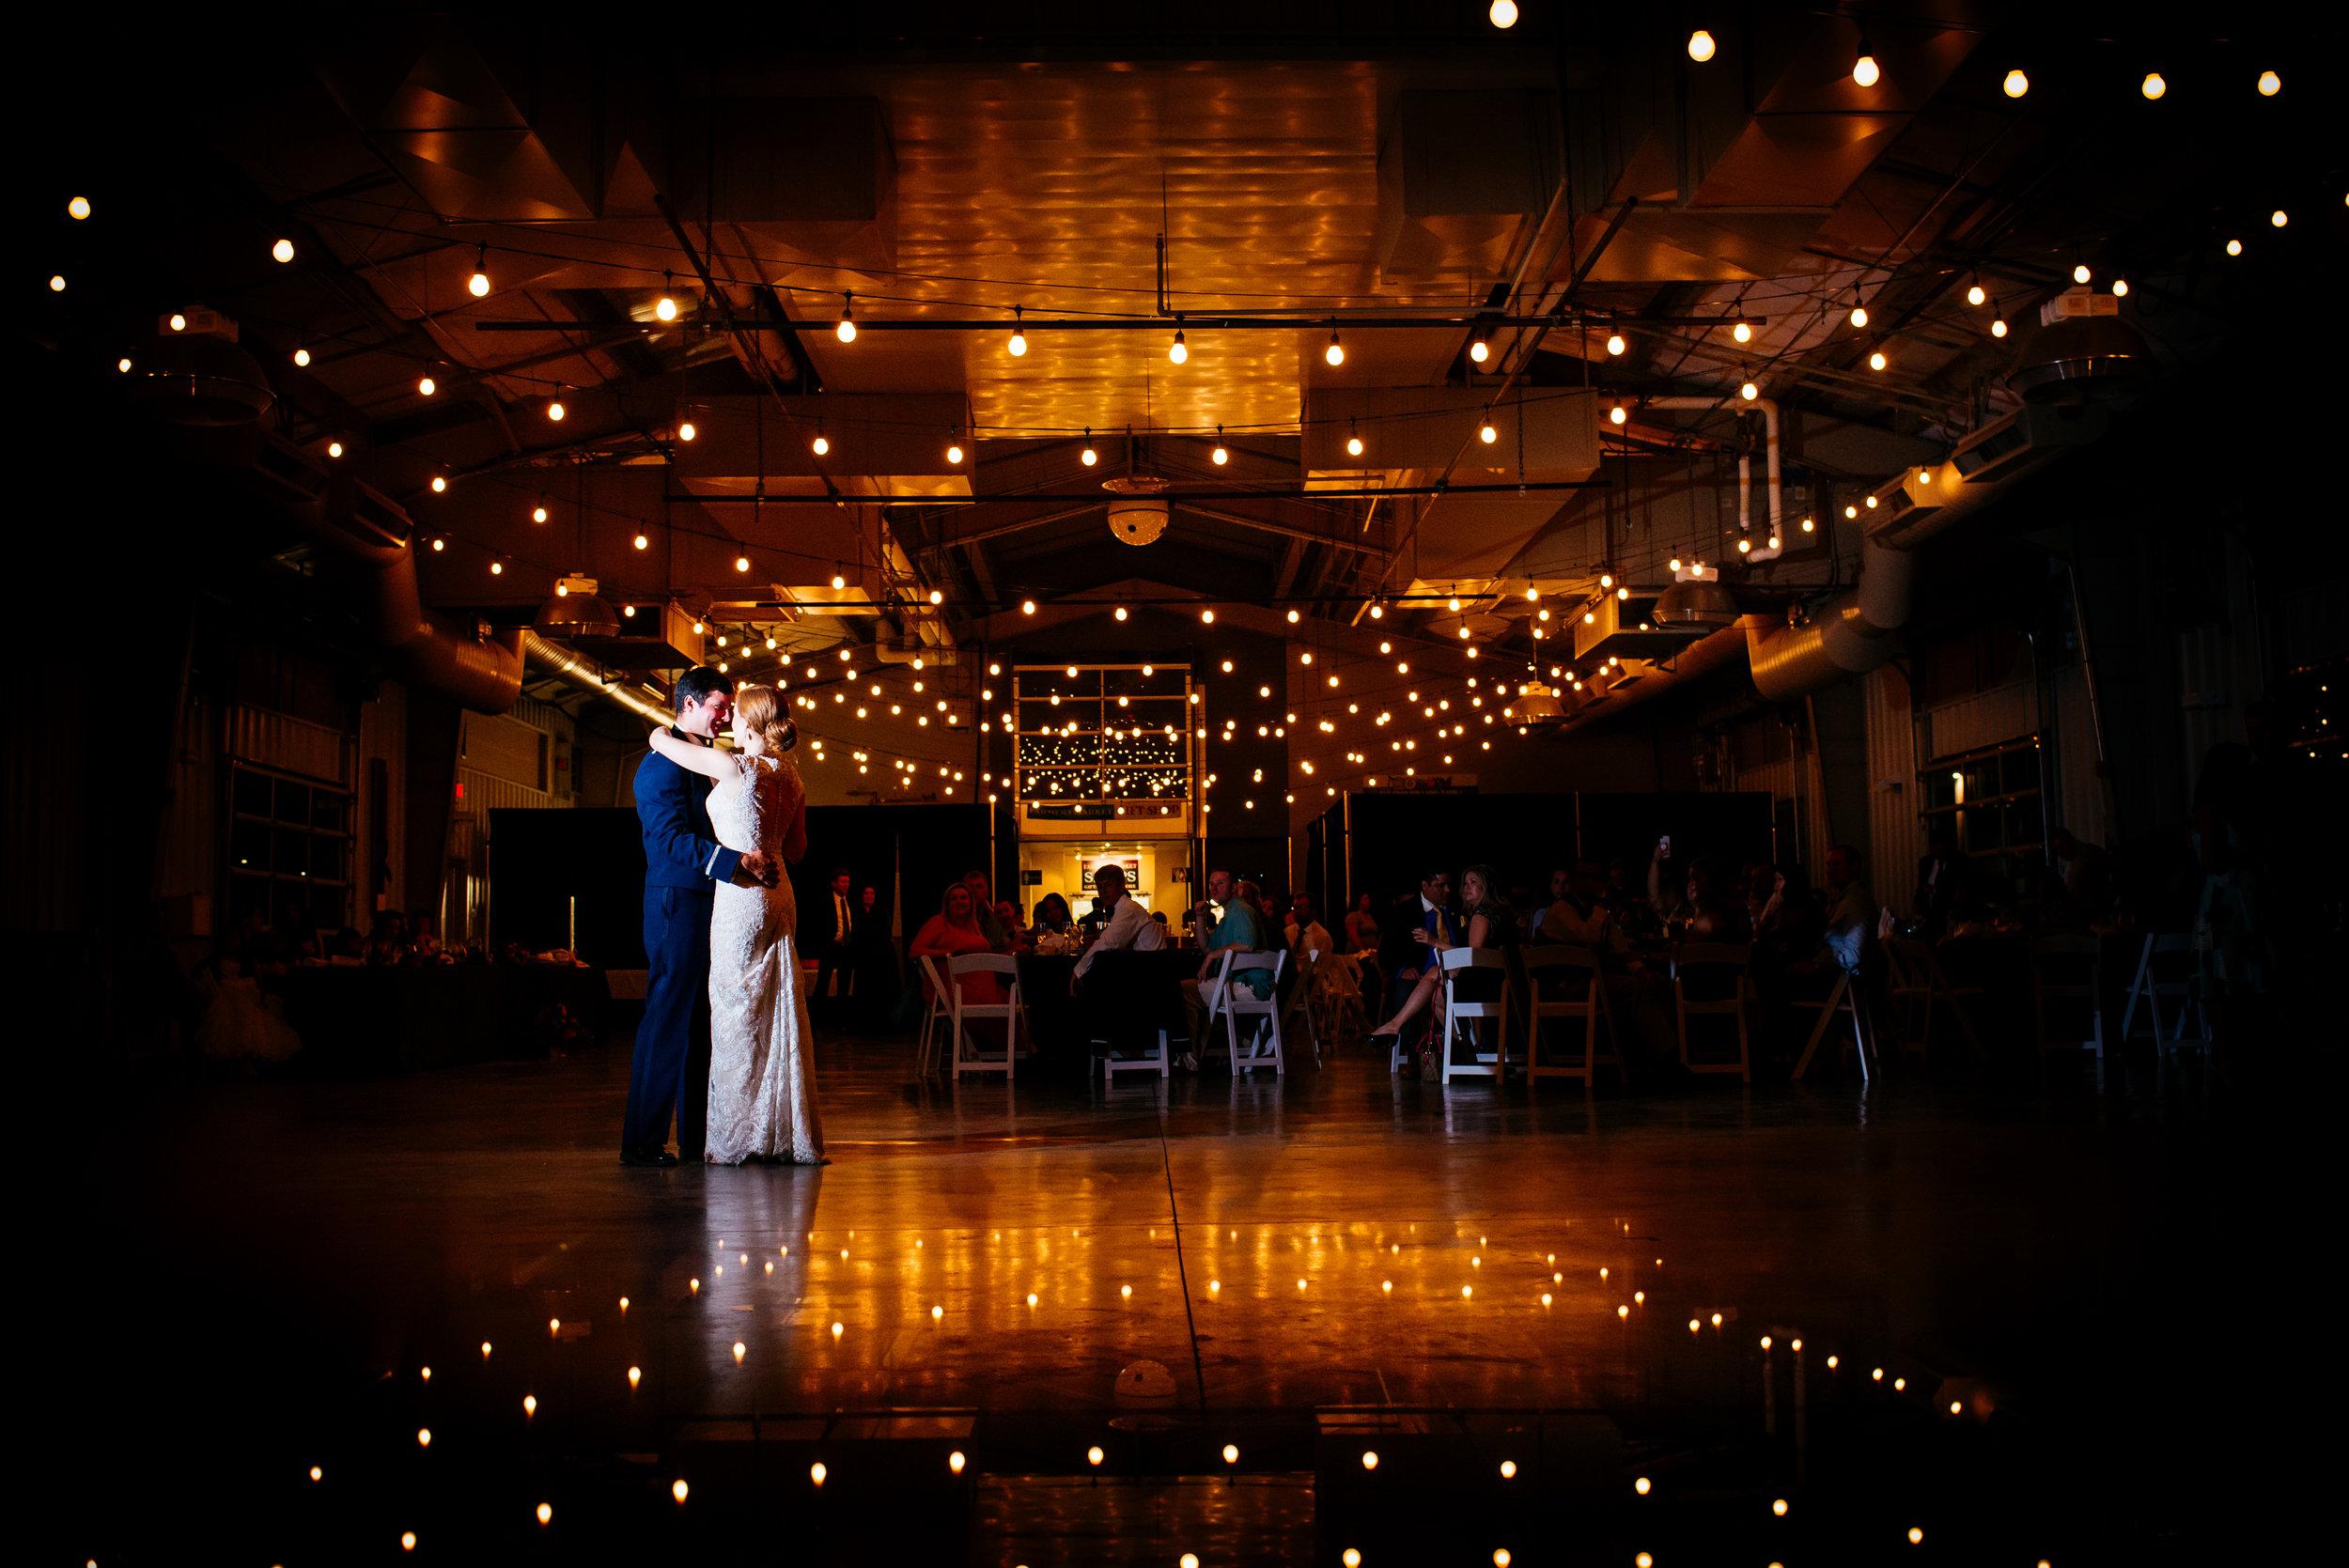 Santa Fe Railyards Wedding Extended Play Photography-17.jpg